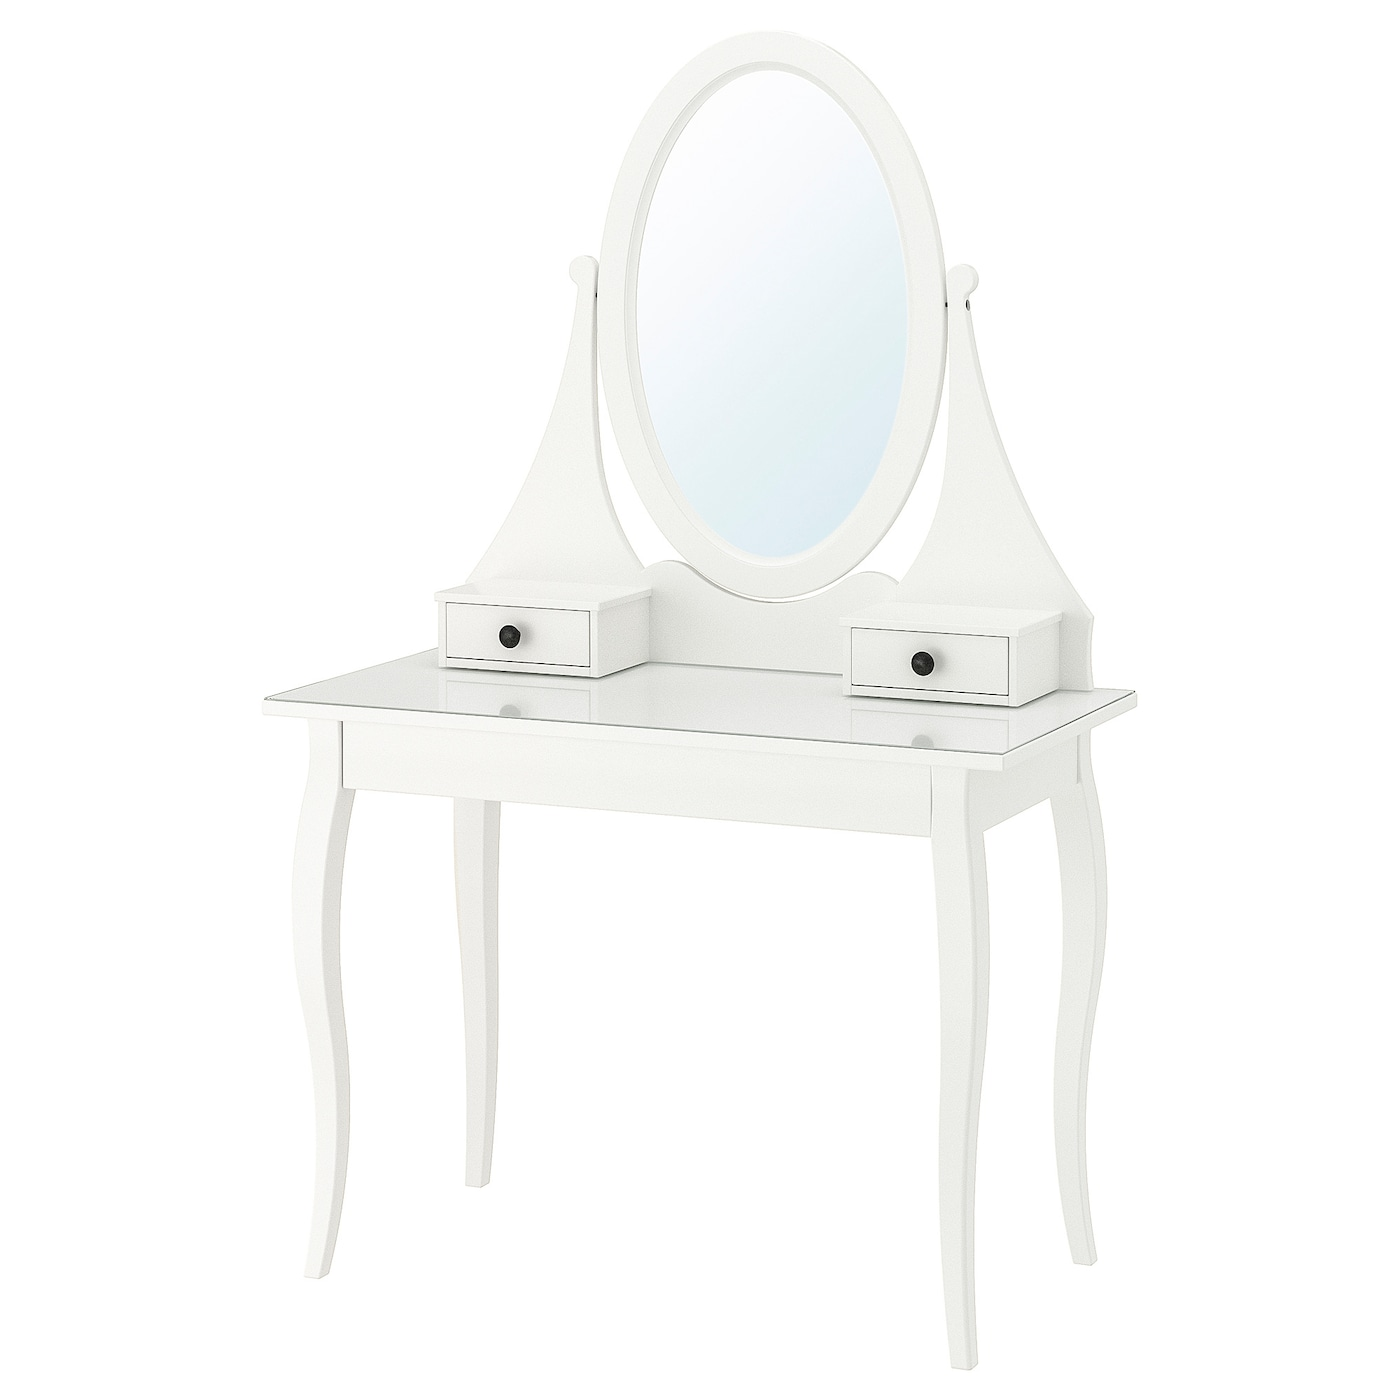 Hemnes Dressing Table With Mirror White 39 3 8x19 5 8 Ikea